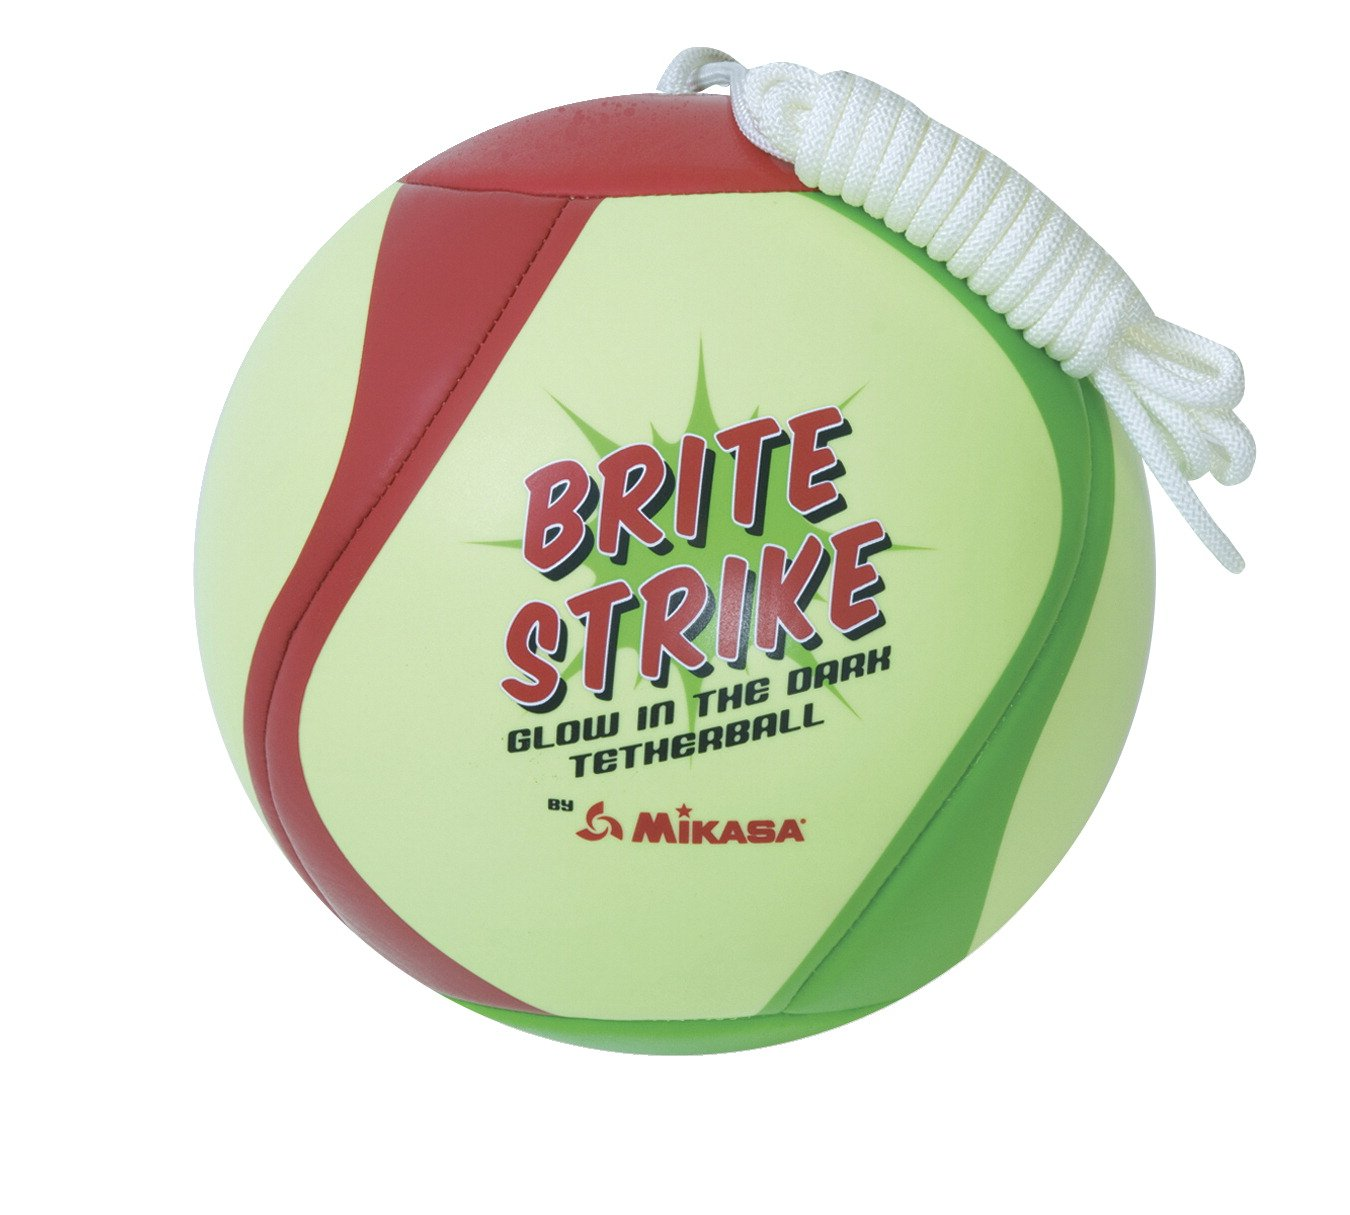 Mikasa Brite Strike Tetherball